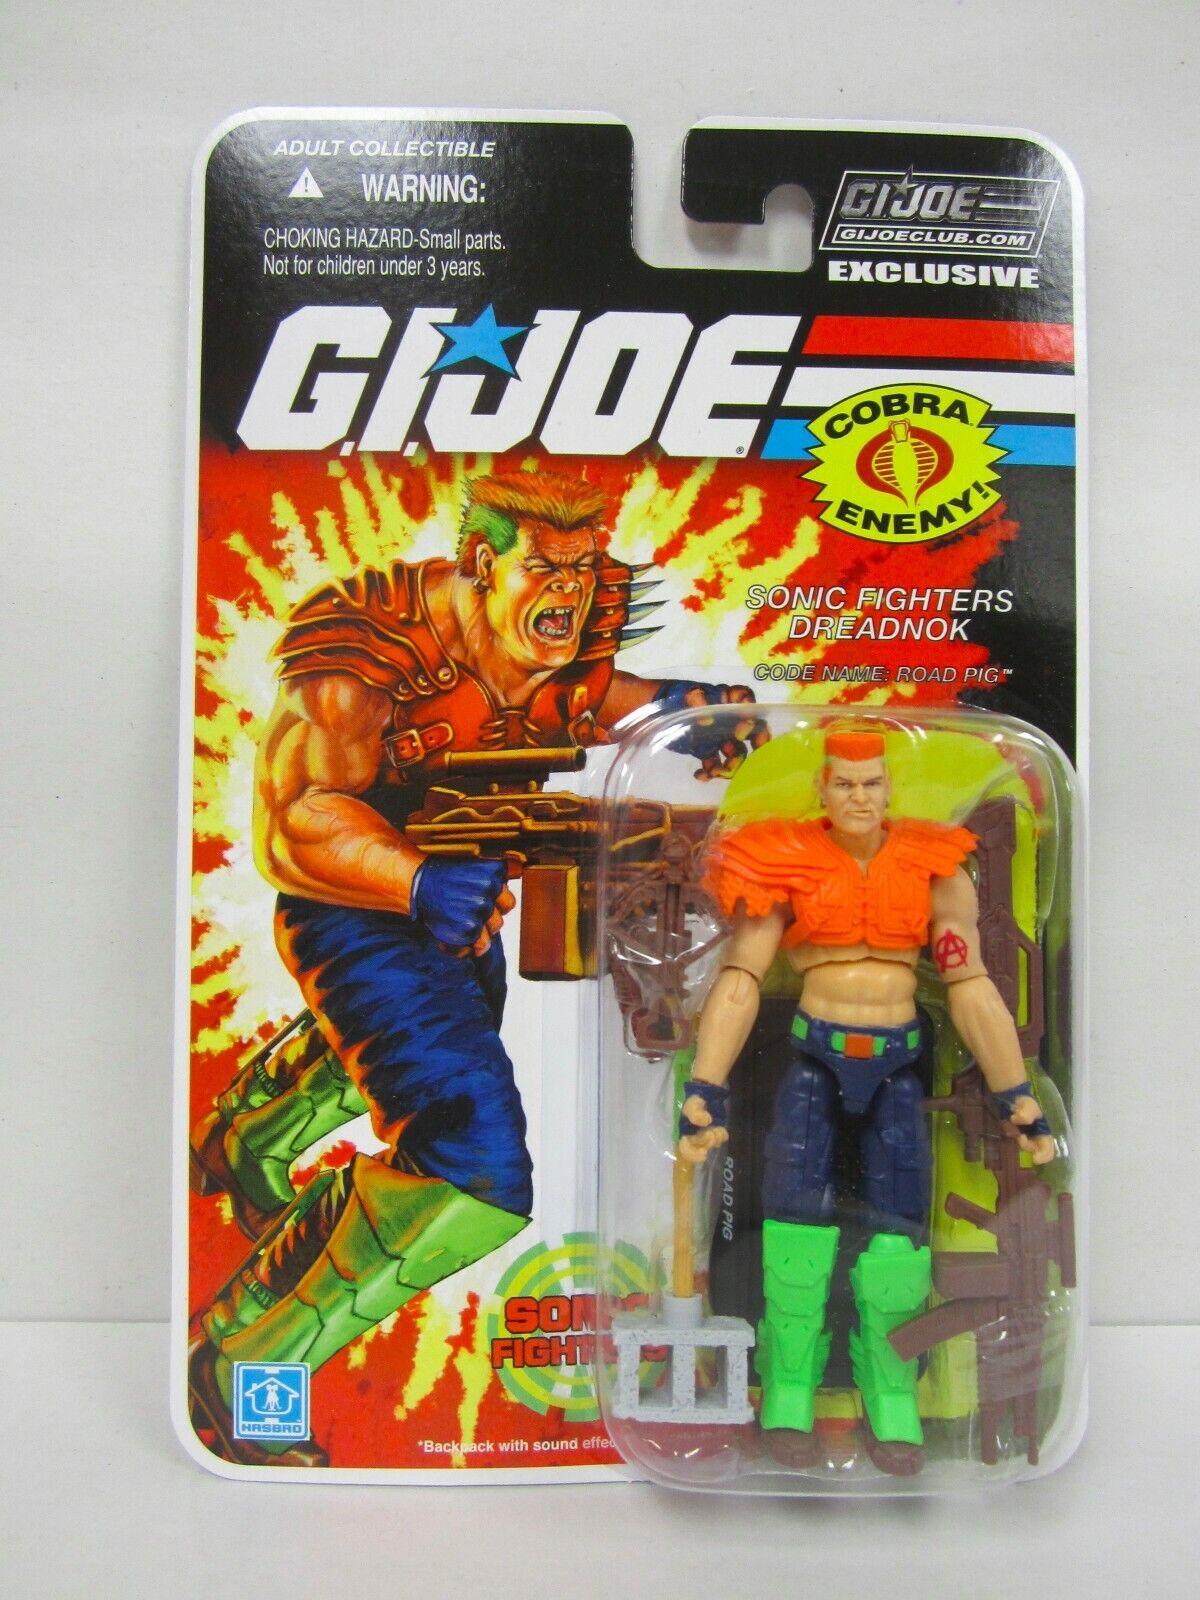 G.I. Joe Collector's Club FSS final 12 Sonic Fighter Road Pig acción figura menta en tarjeta